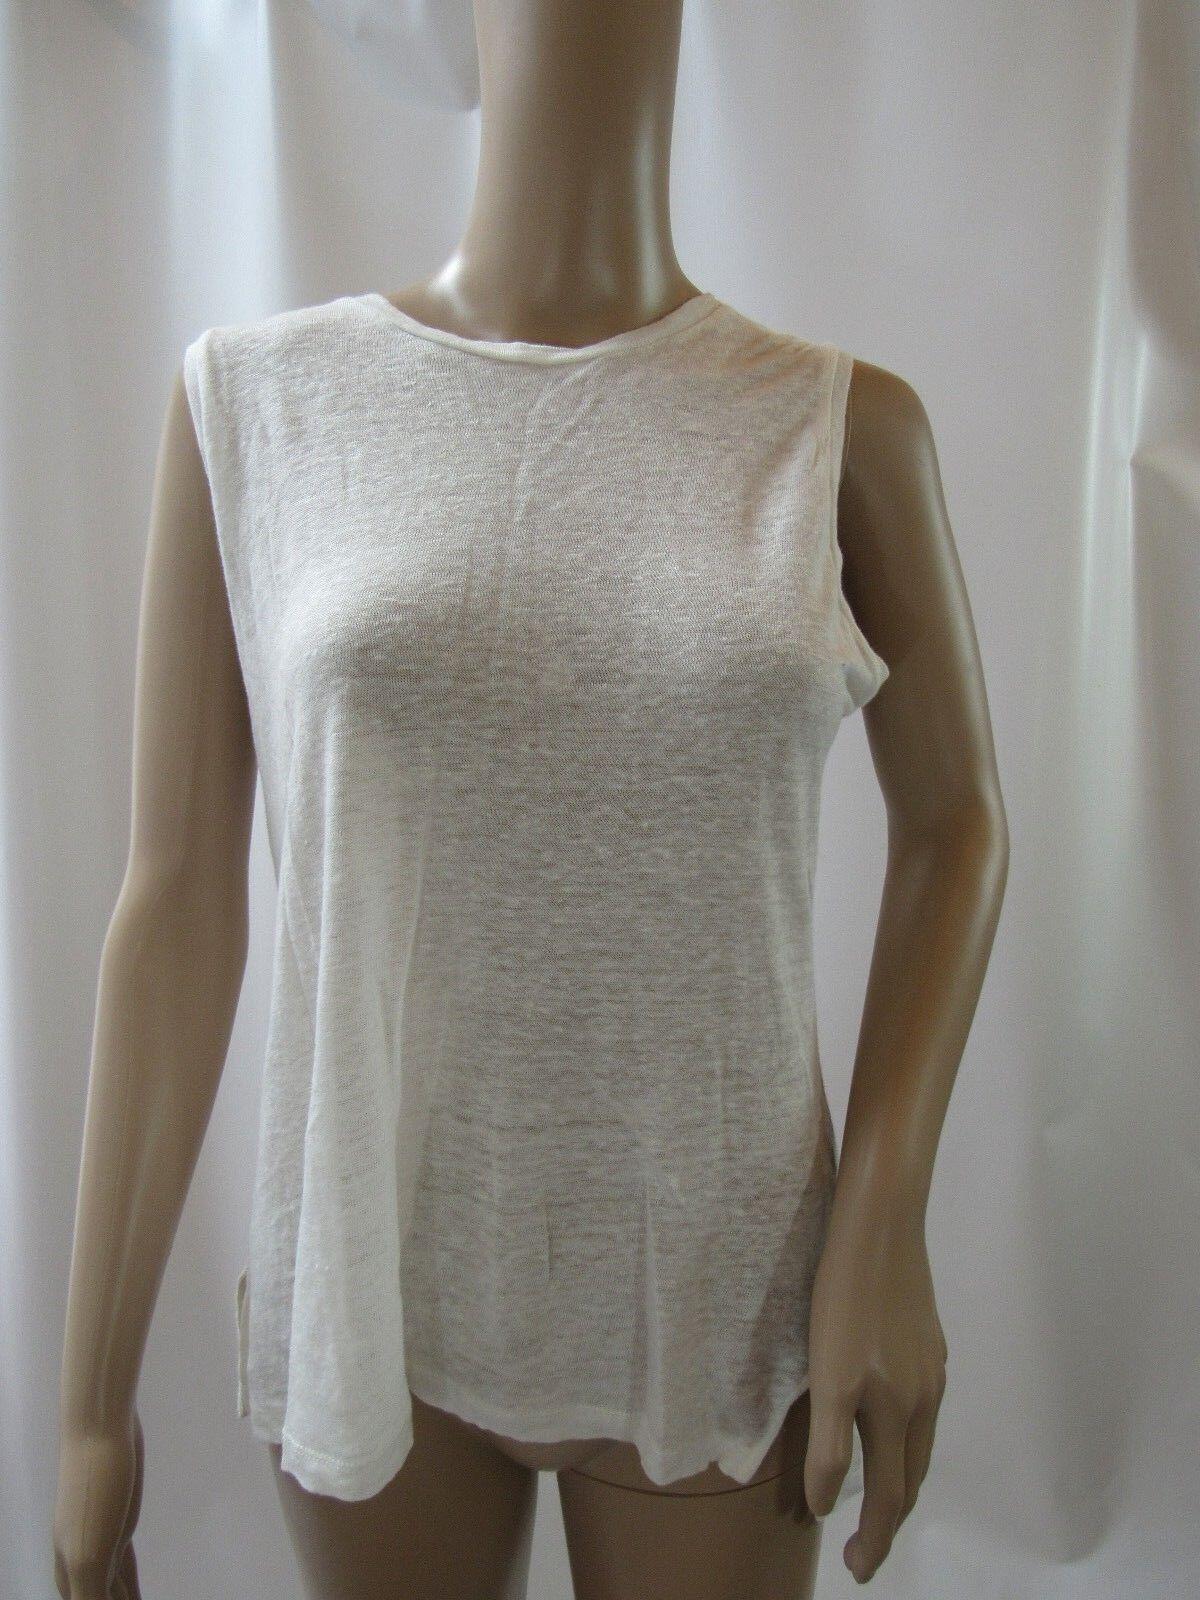 RAG&BONE JEAN Sleeveless Solid White Linen Top Size S